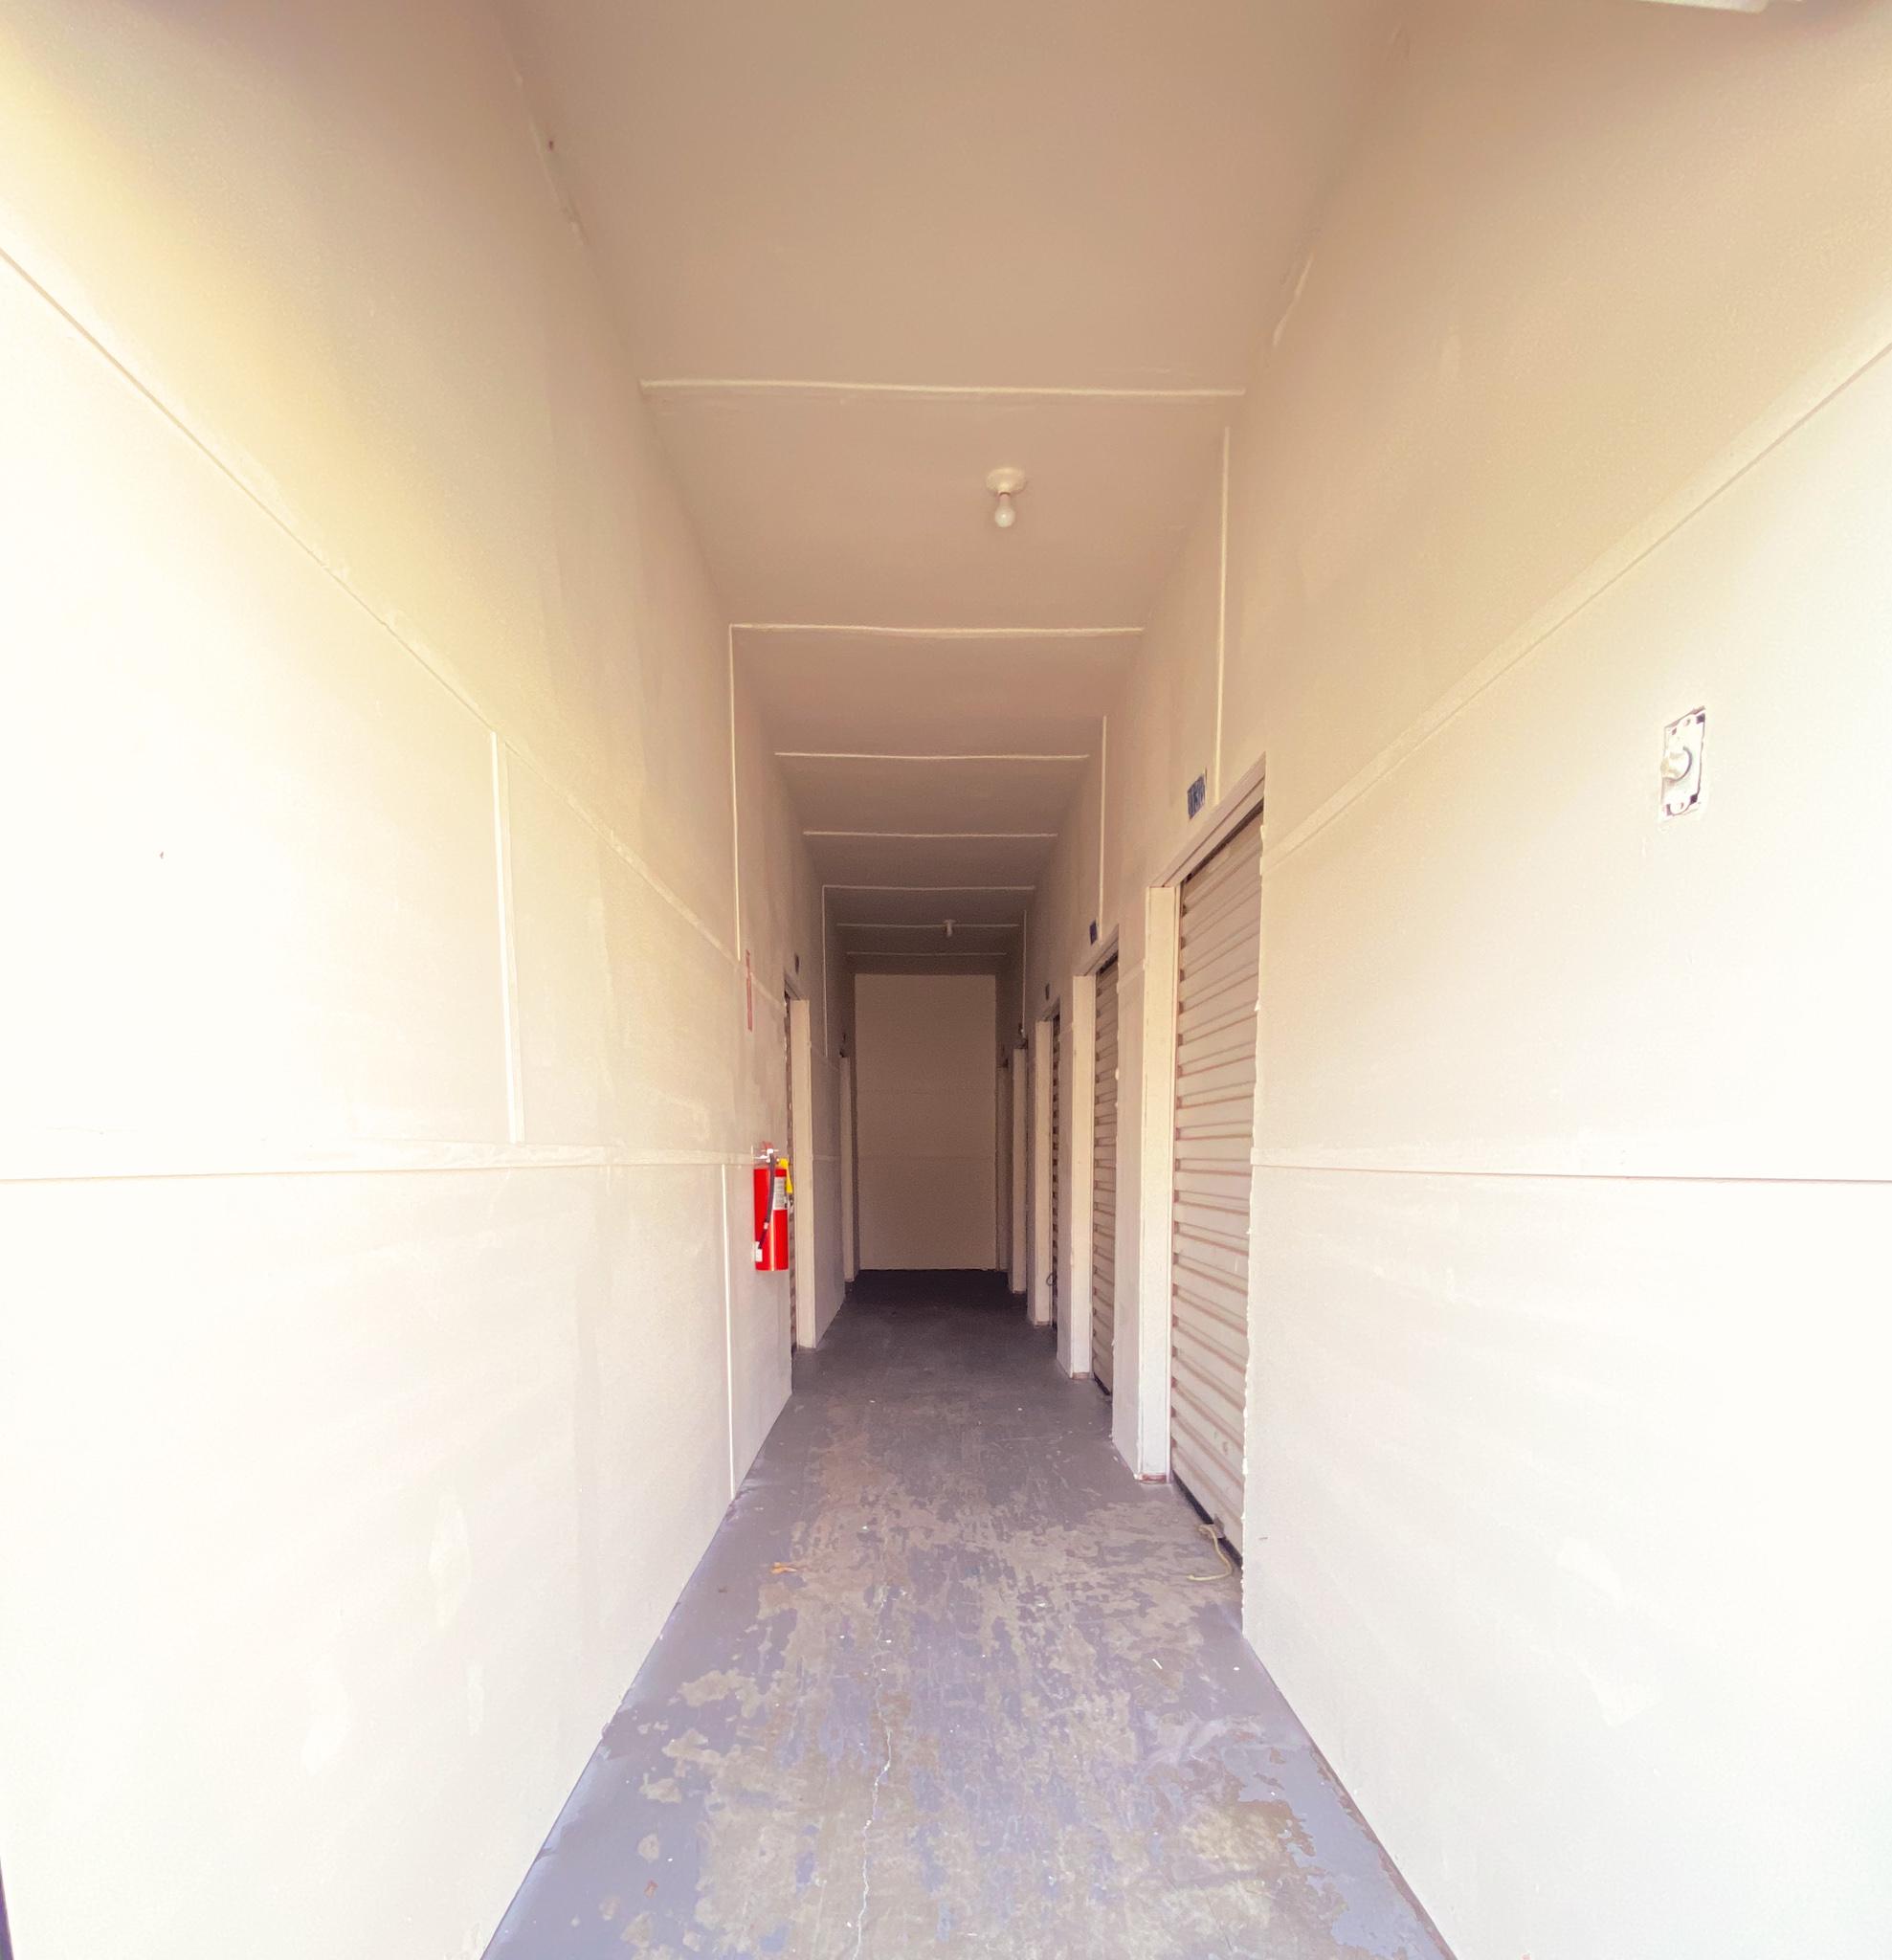 A-1 Mini Storage Rex Hallway